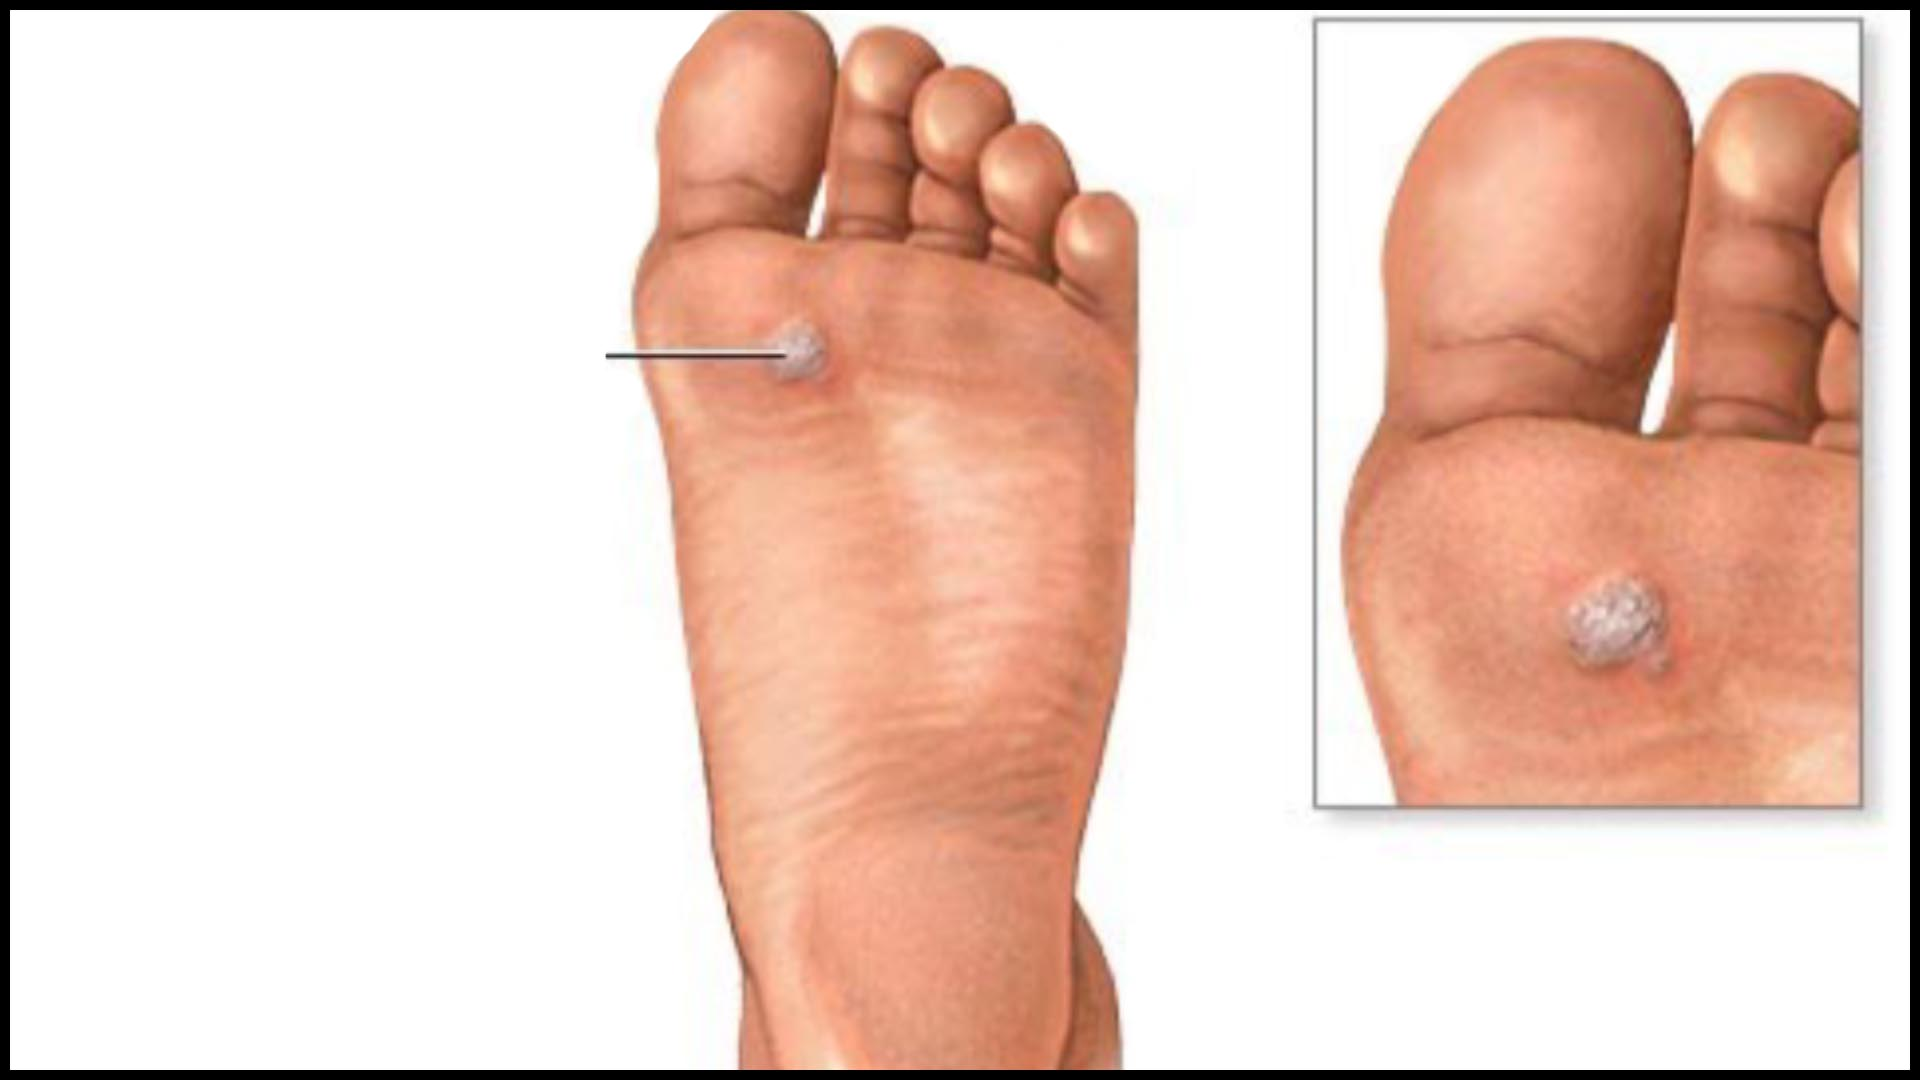 Squamous cell papilloma and verruca vulgaris. Squamous cell papilloma and verruca vulgaris